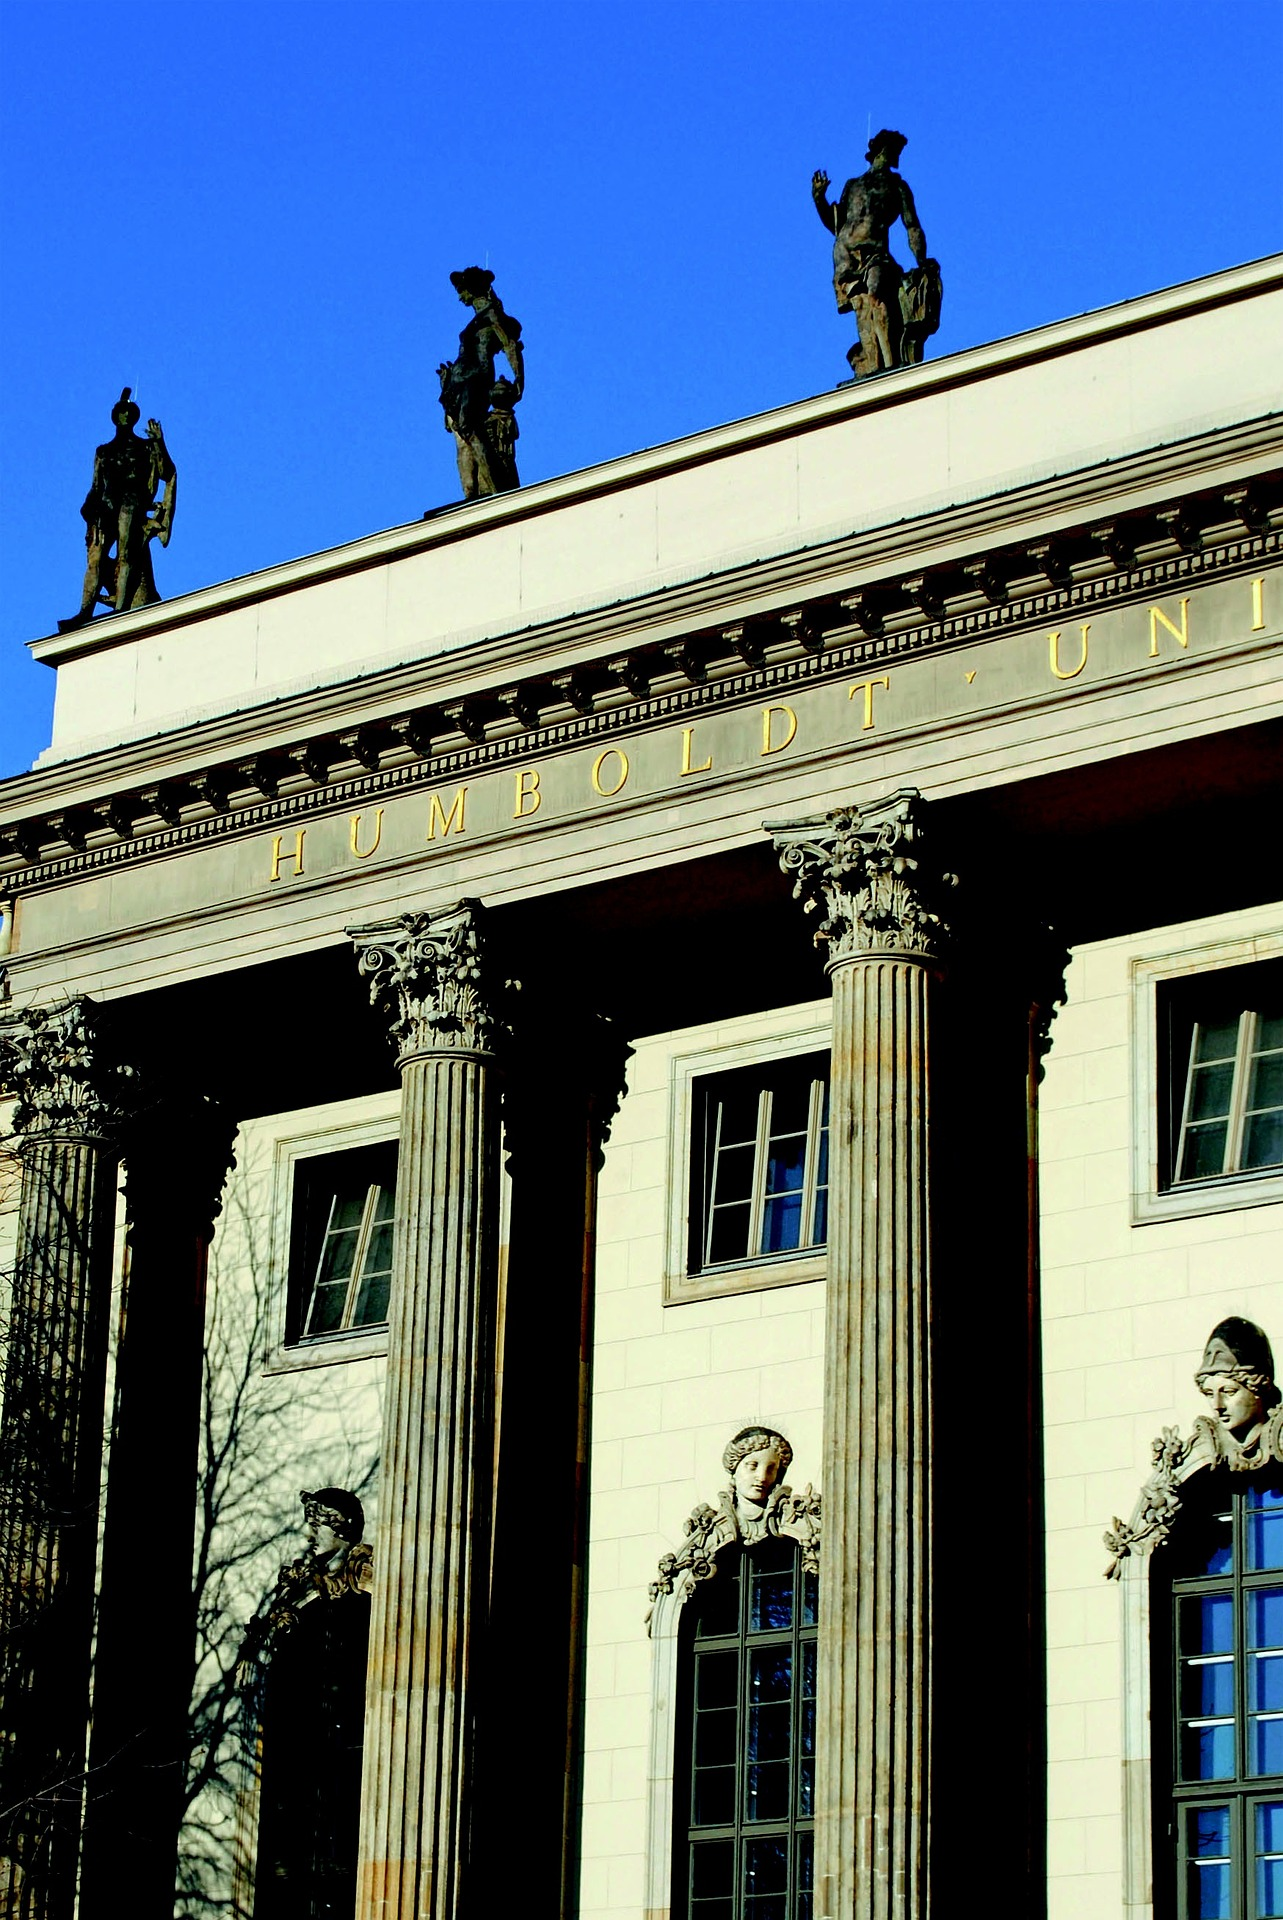 humboldt-university-1274838_1920